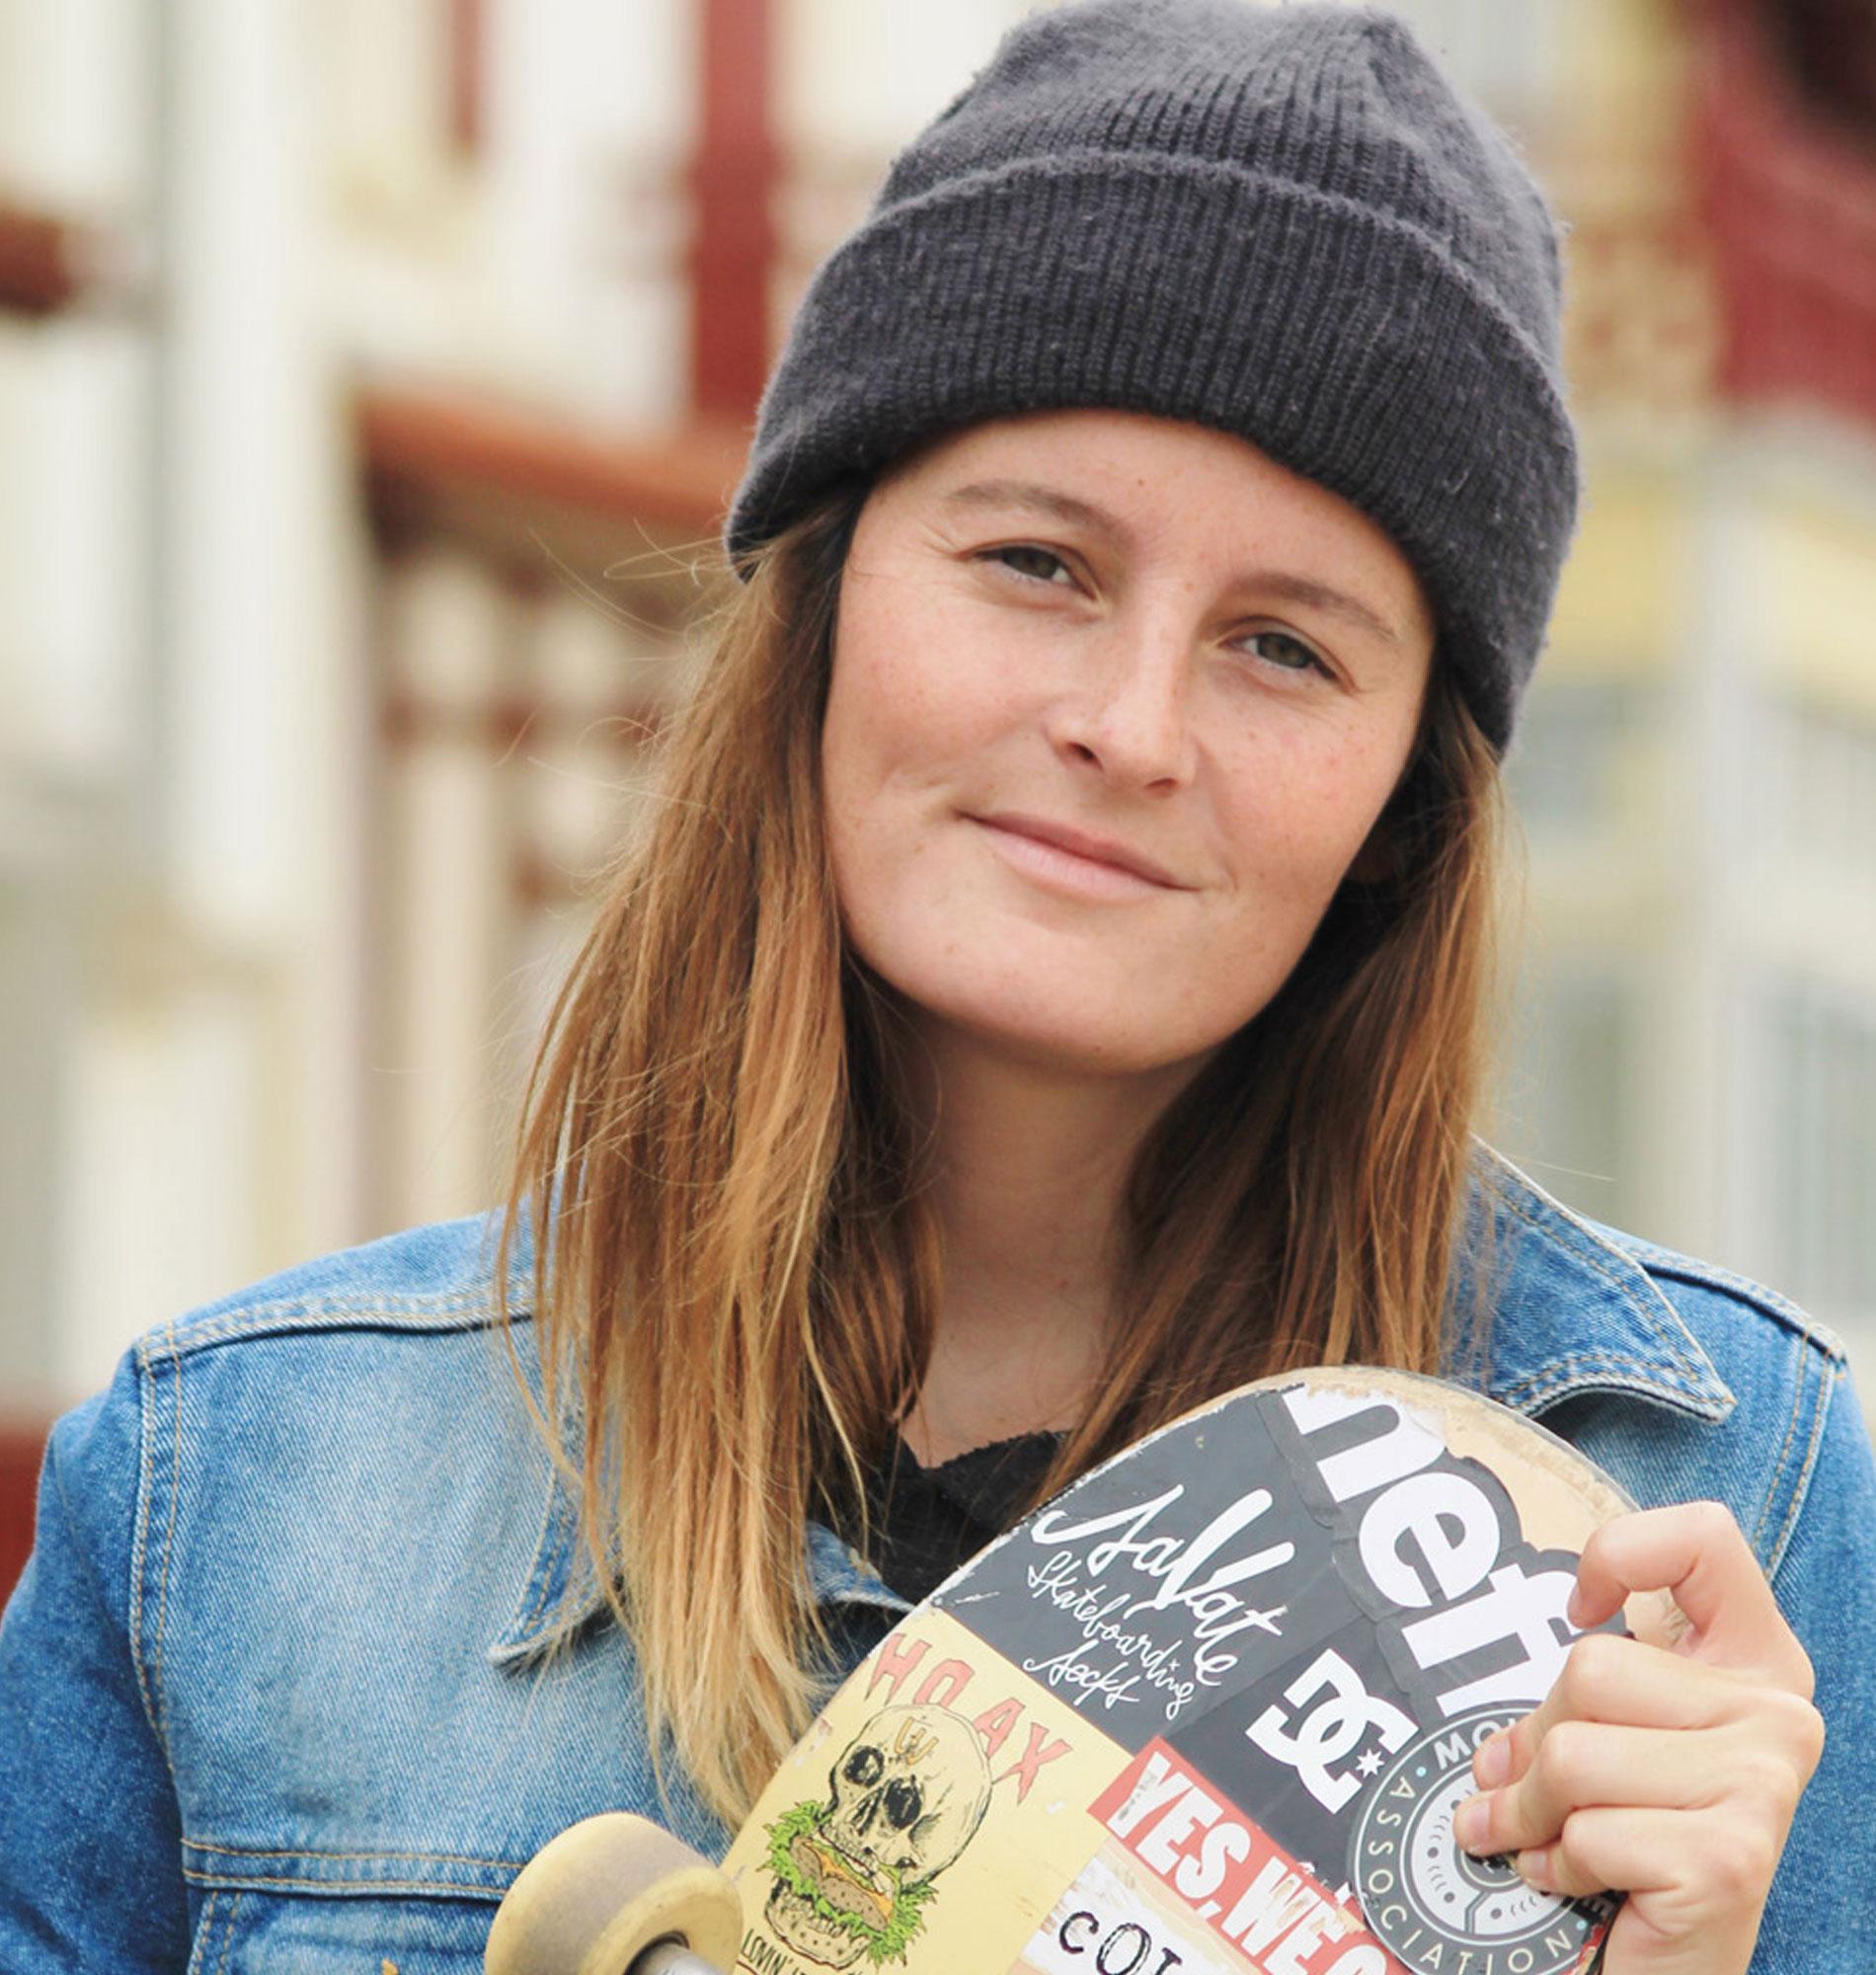 Skate à Saint-Jean-de-Luz avec Pauliana